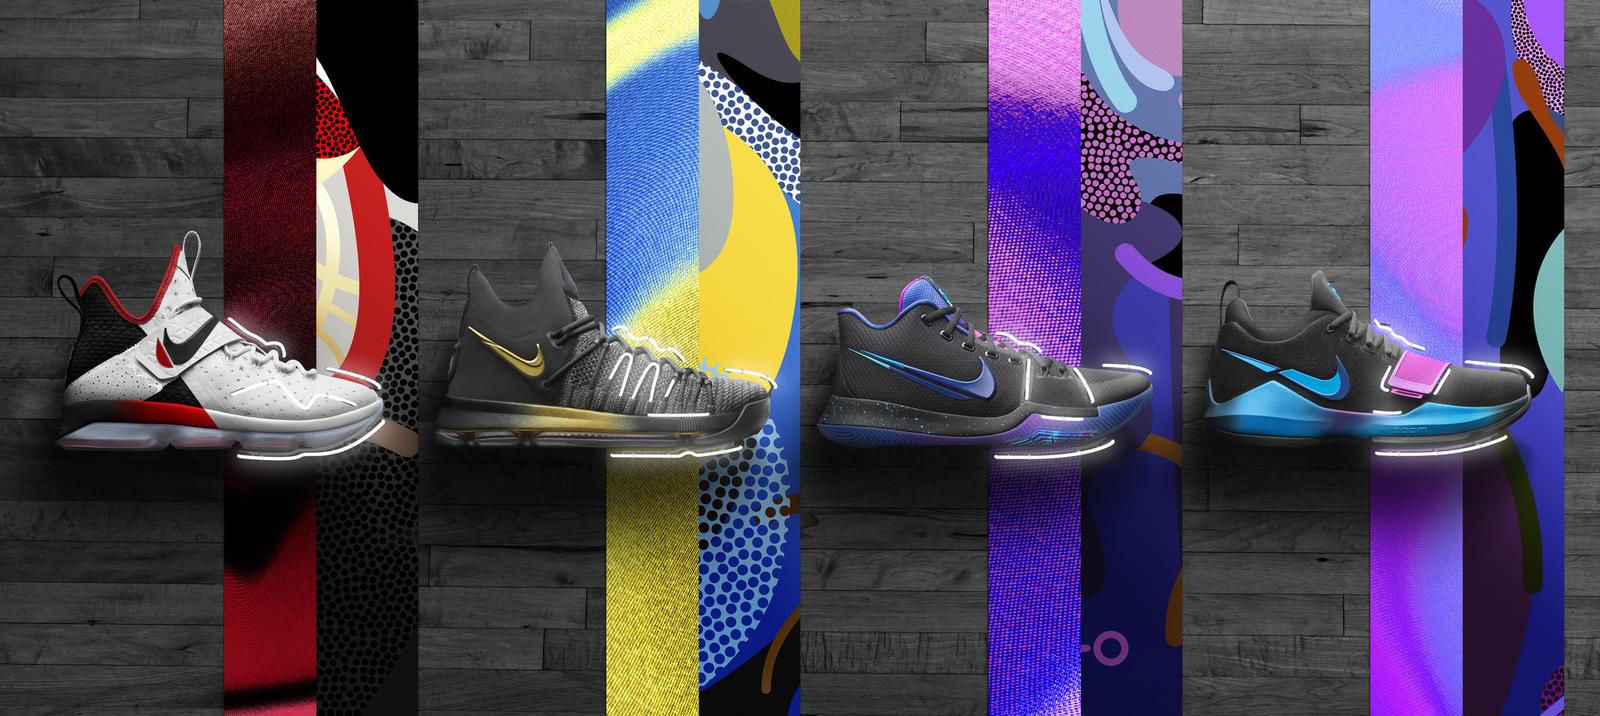 Nike Basketball Flip the Switch